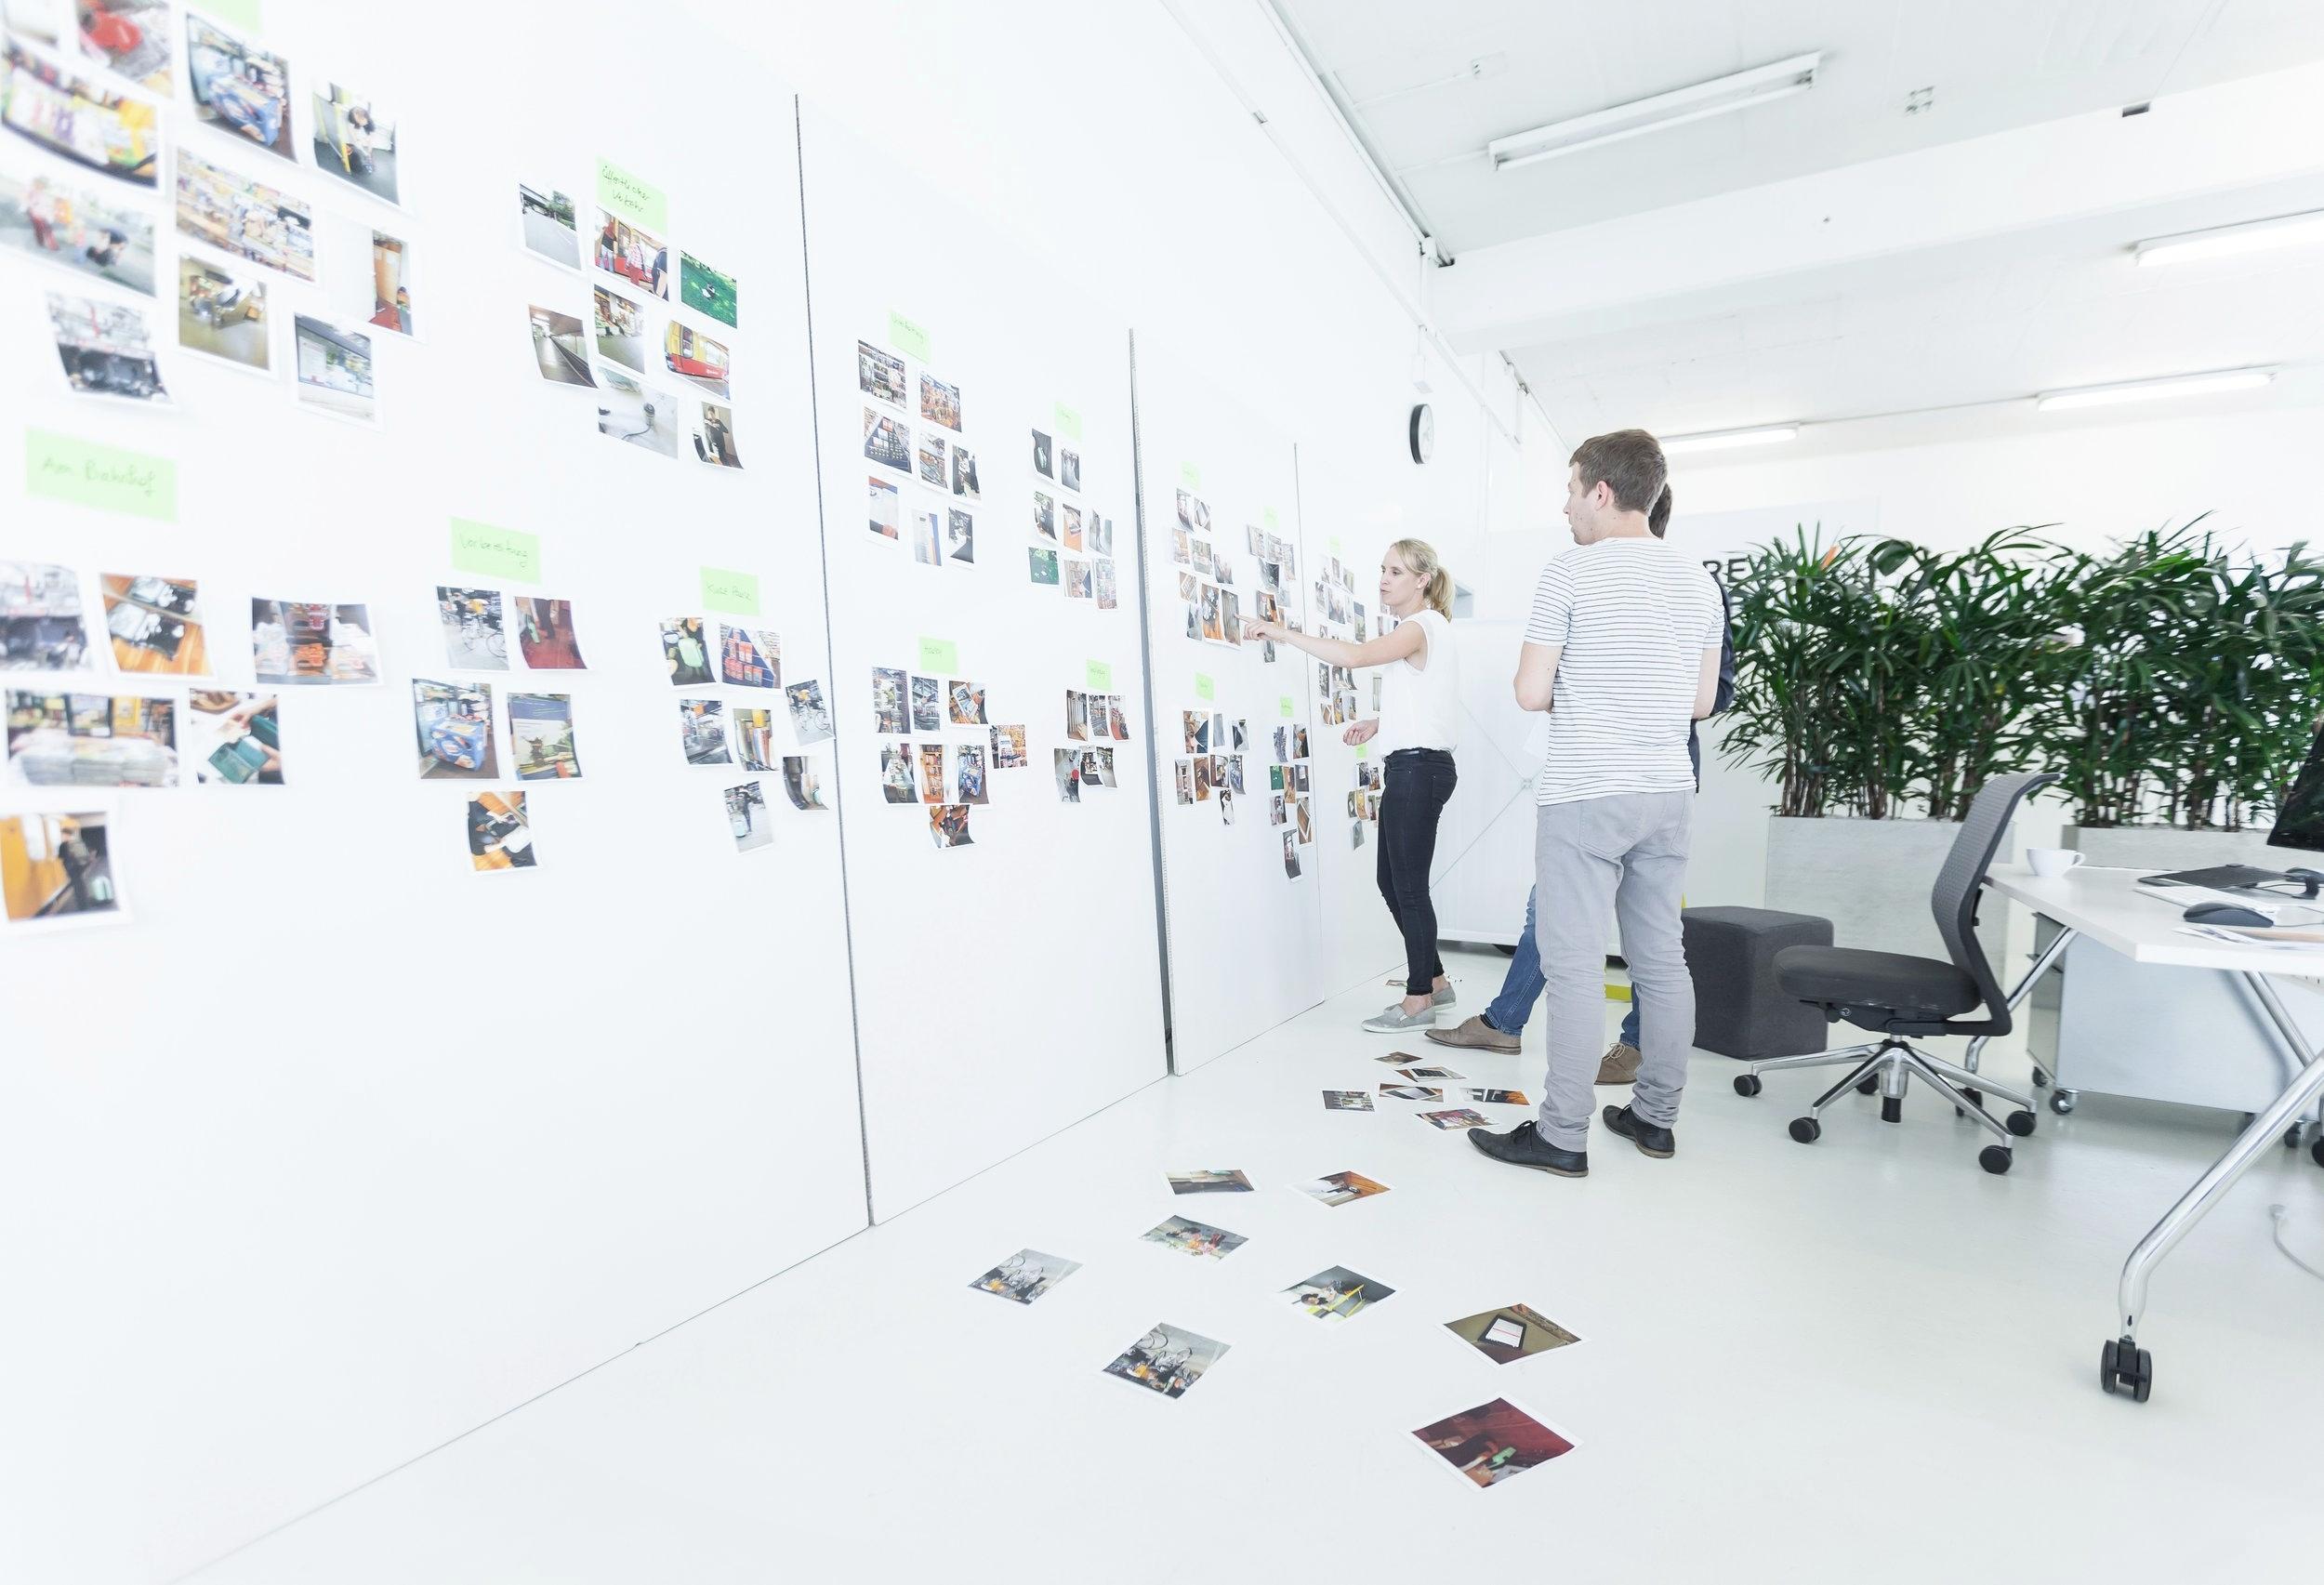 Award Winning Design Thinking Whiteboard